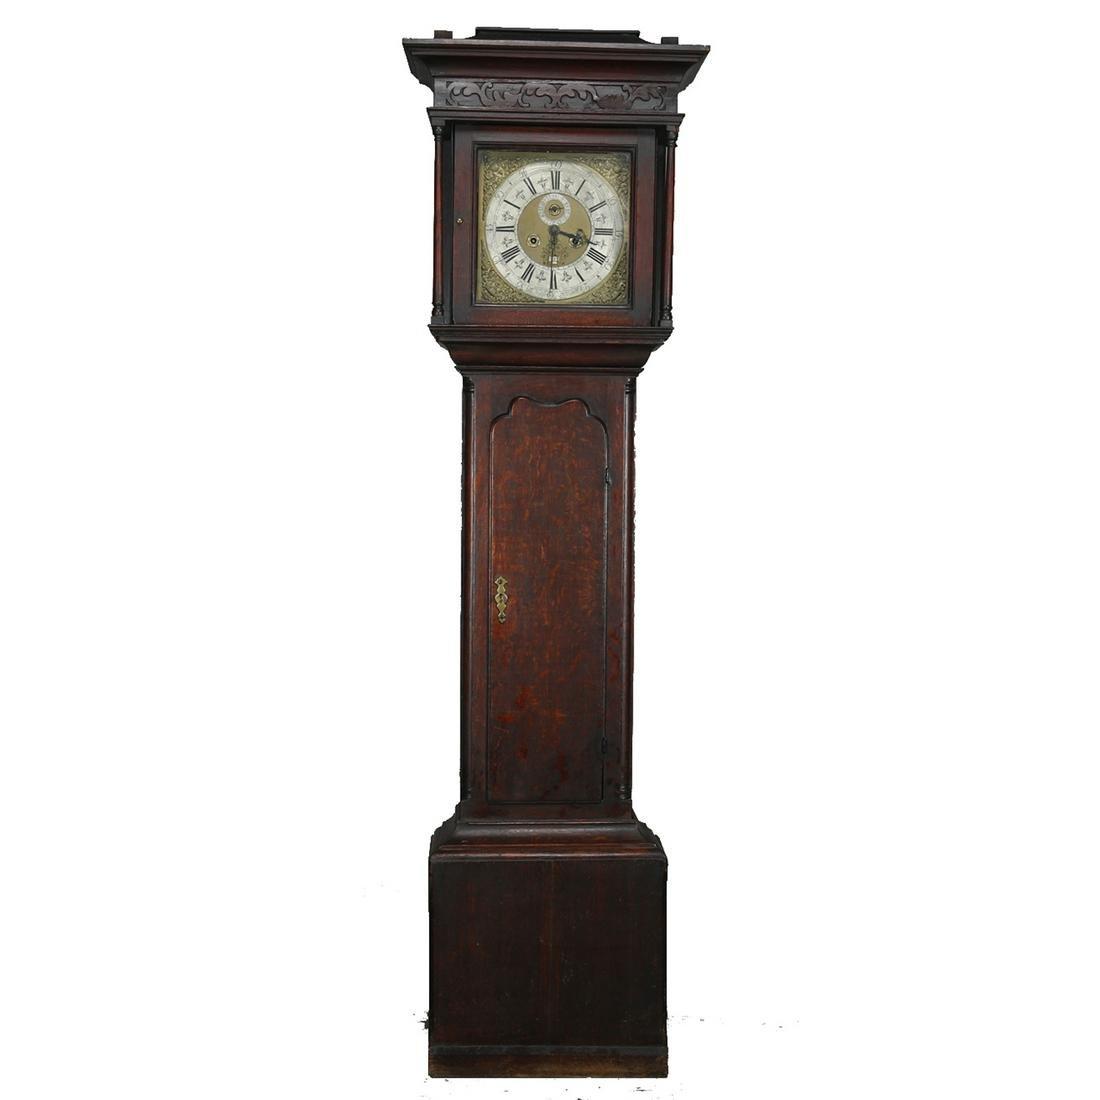 English John Royle Oak Tall Case Clock, 19th C